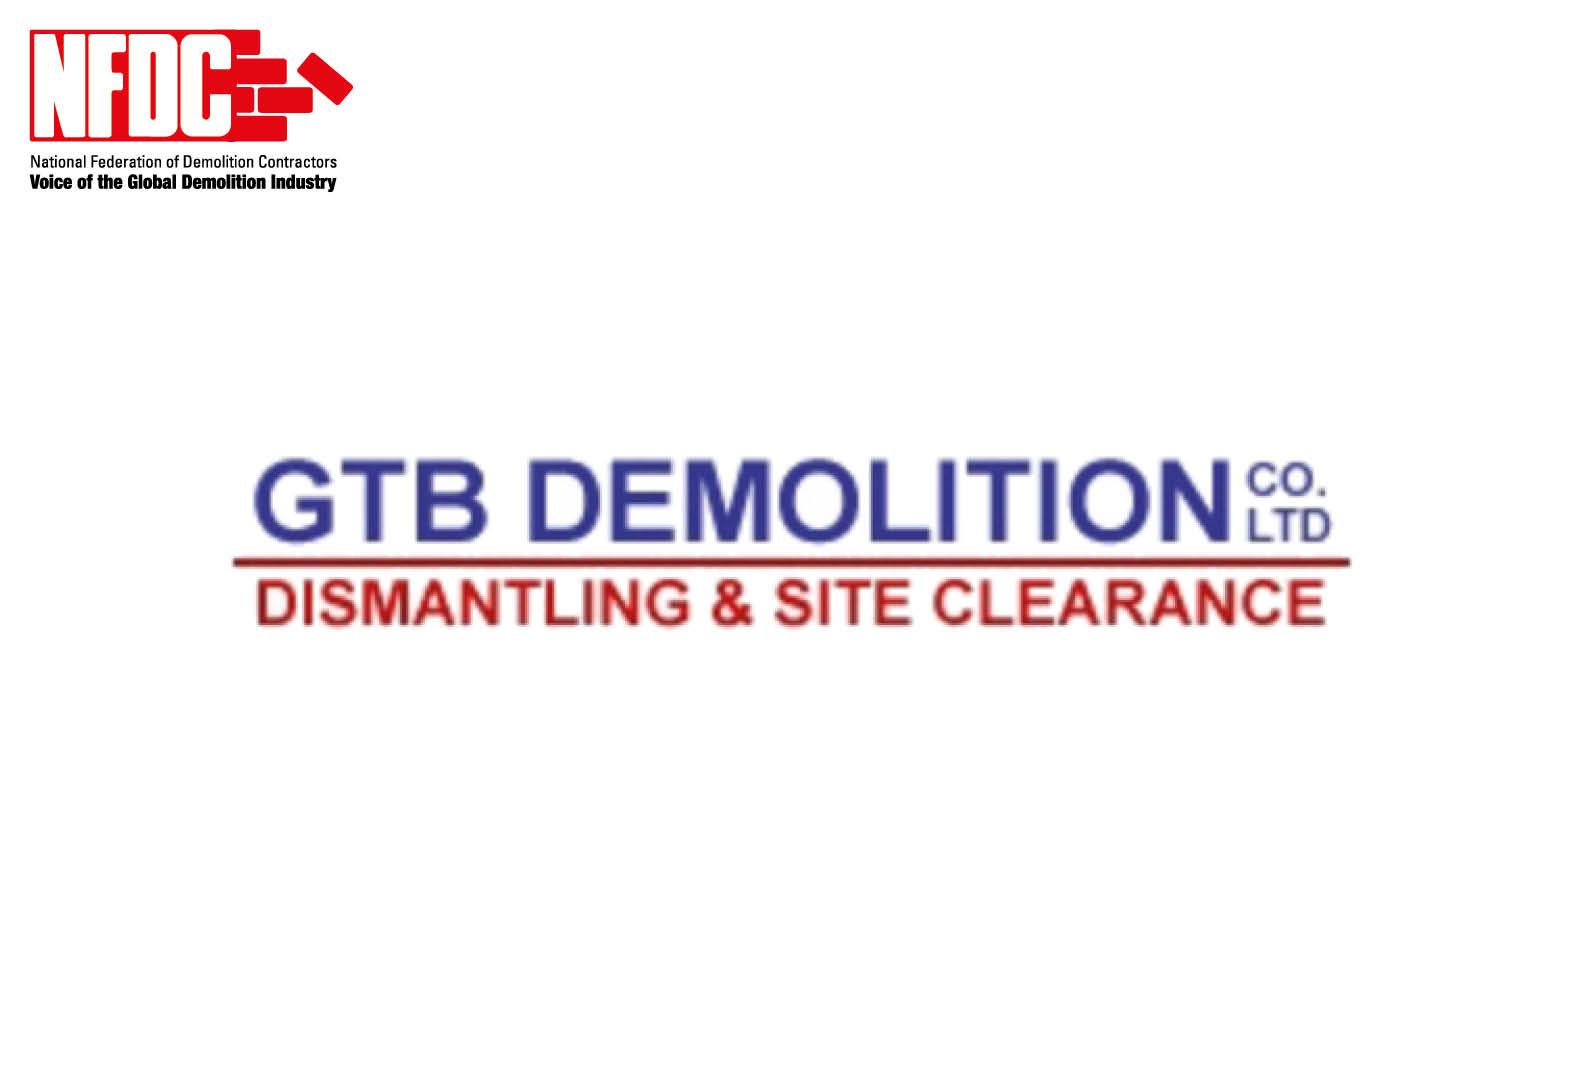 GTB Demolition